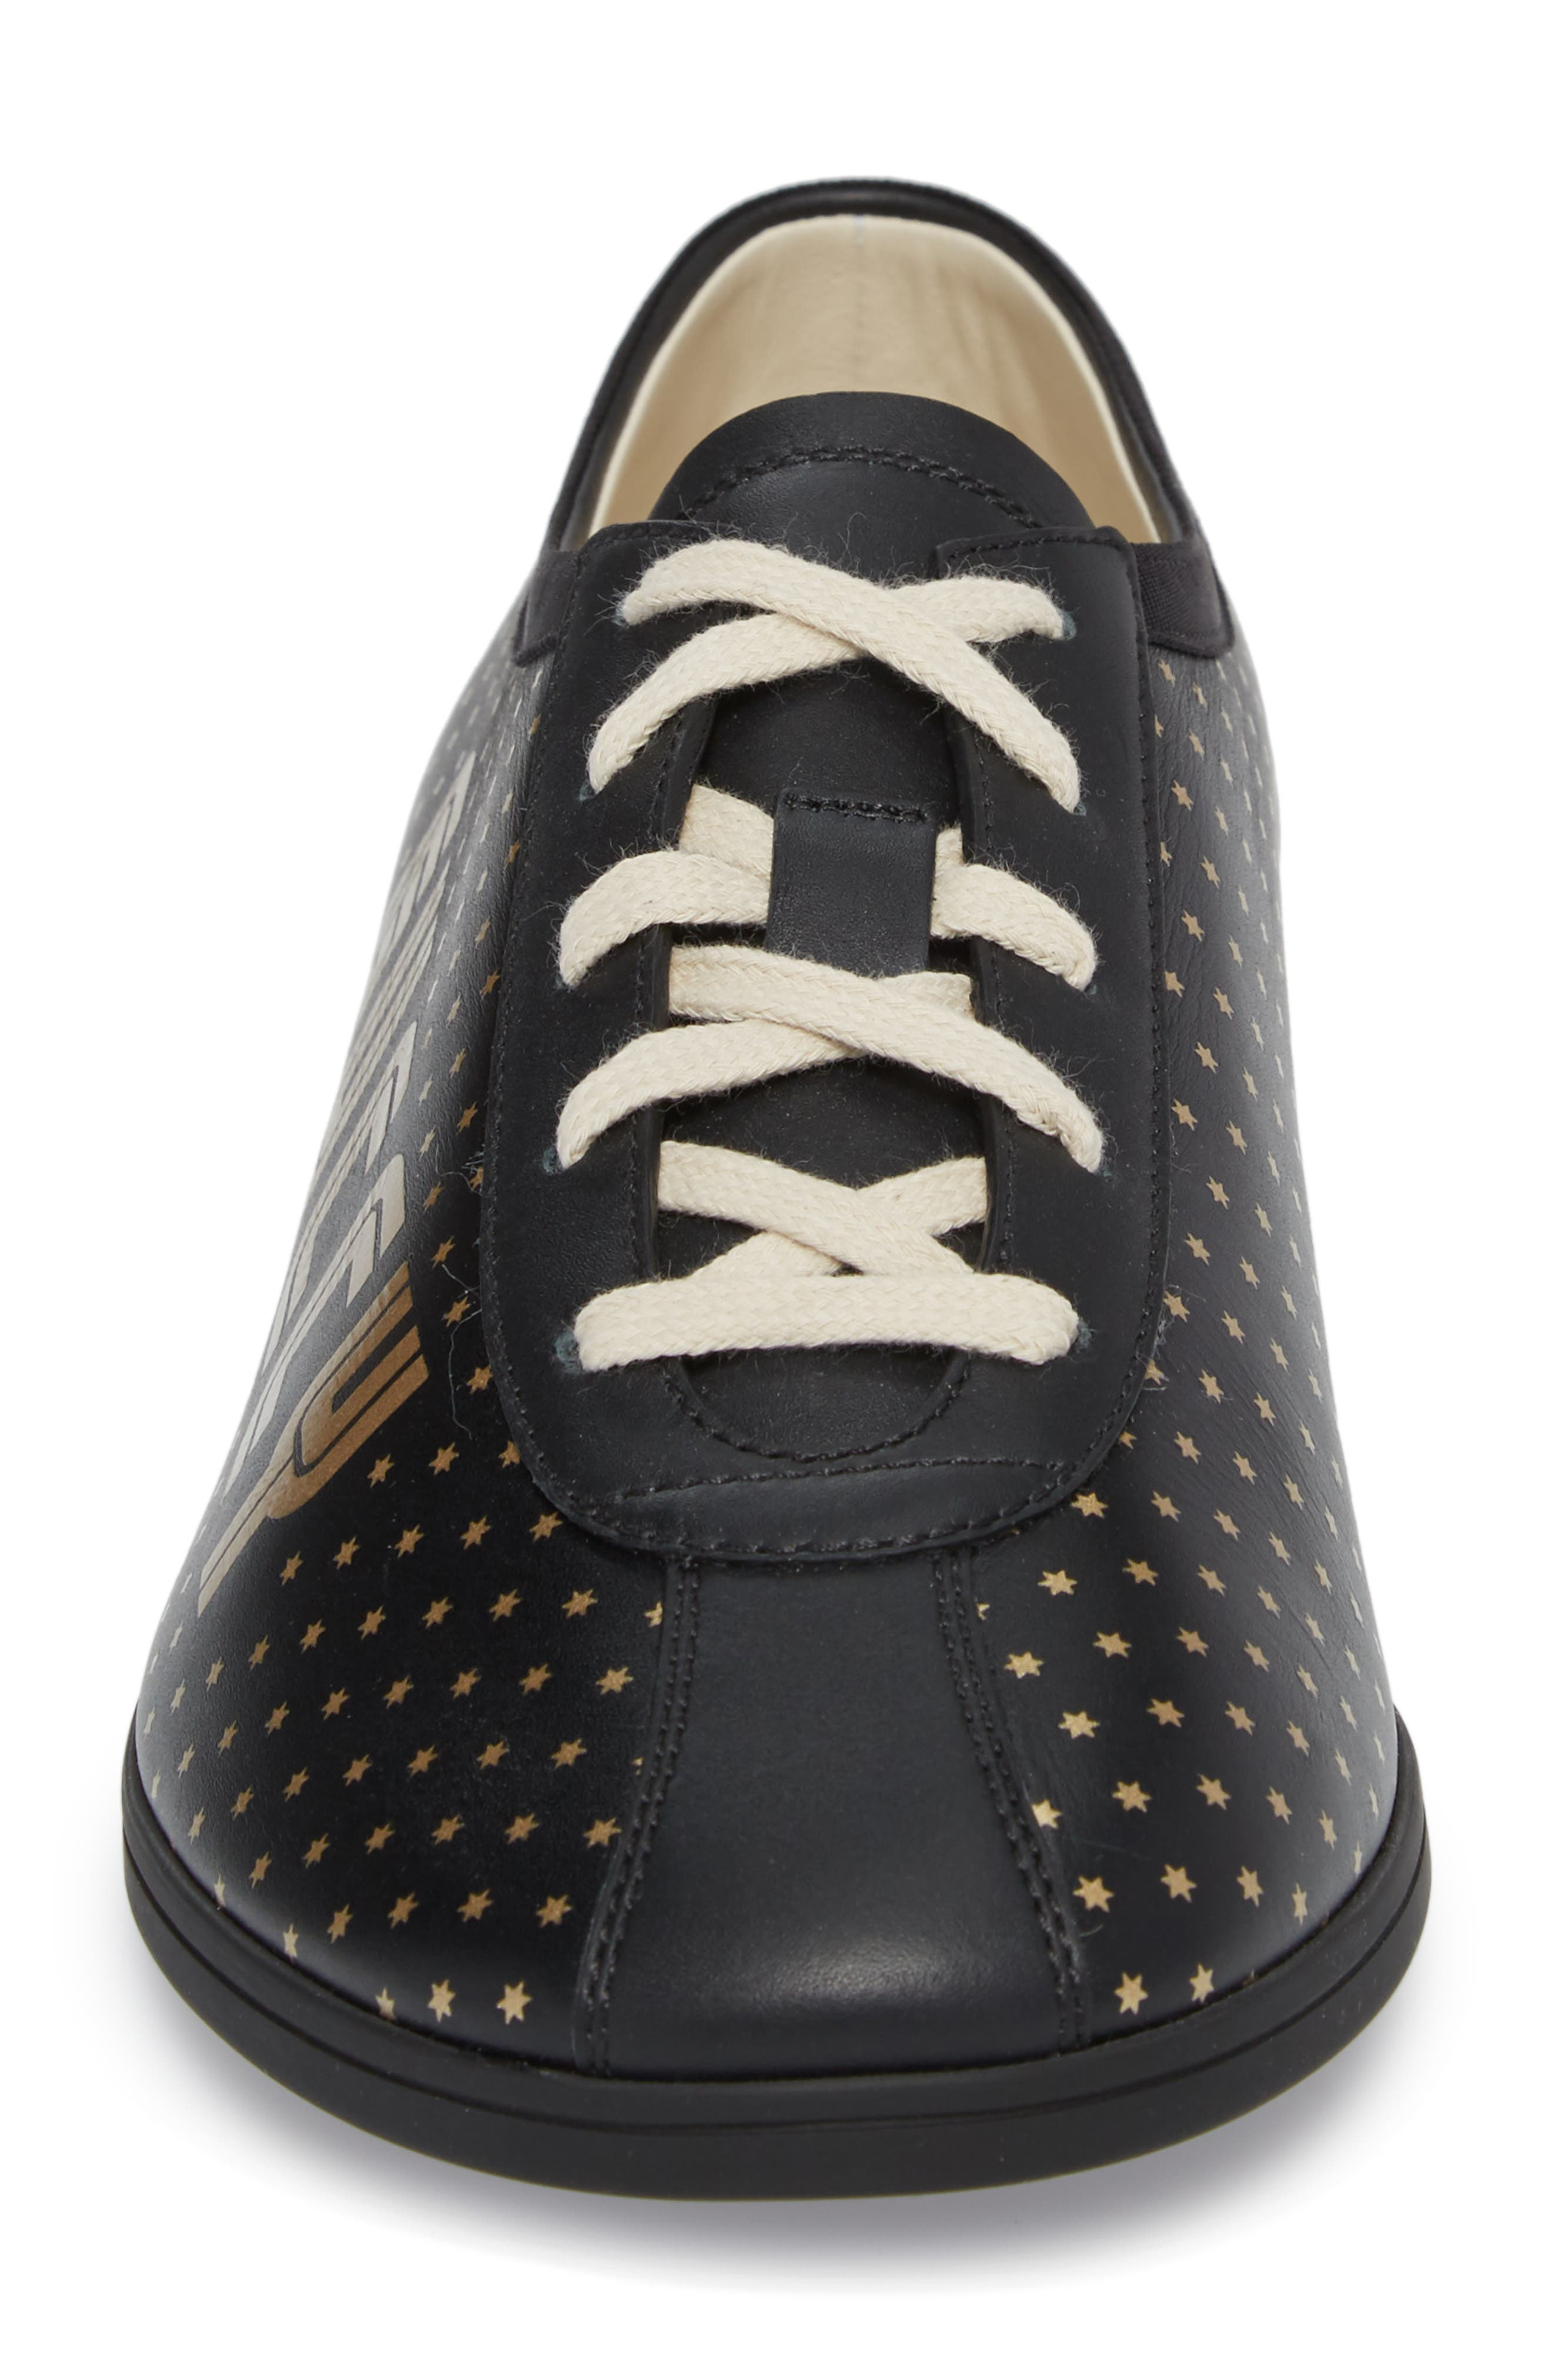 Falacer Guccy Print Sneaker,                             Alternate thumbnail 4, color,                             BLACK/ TAN